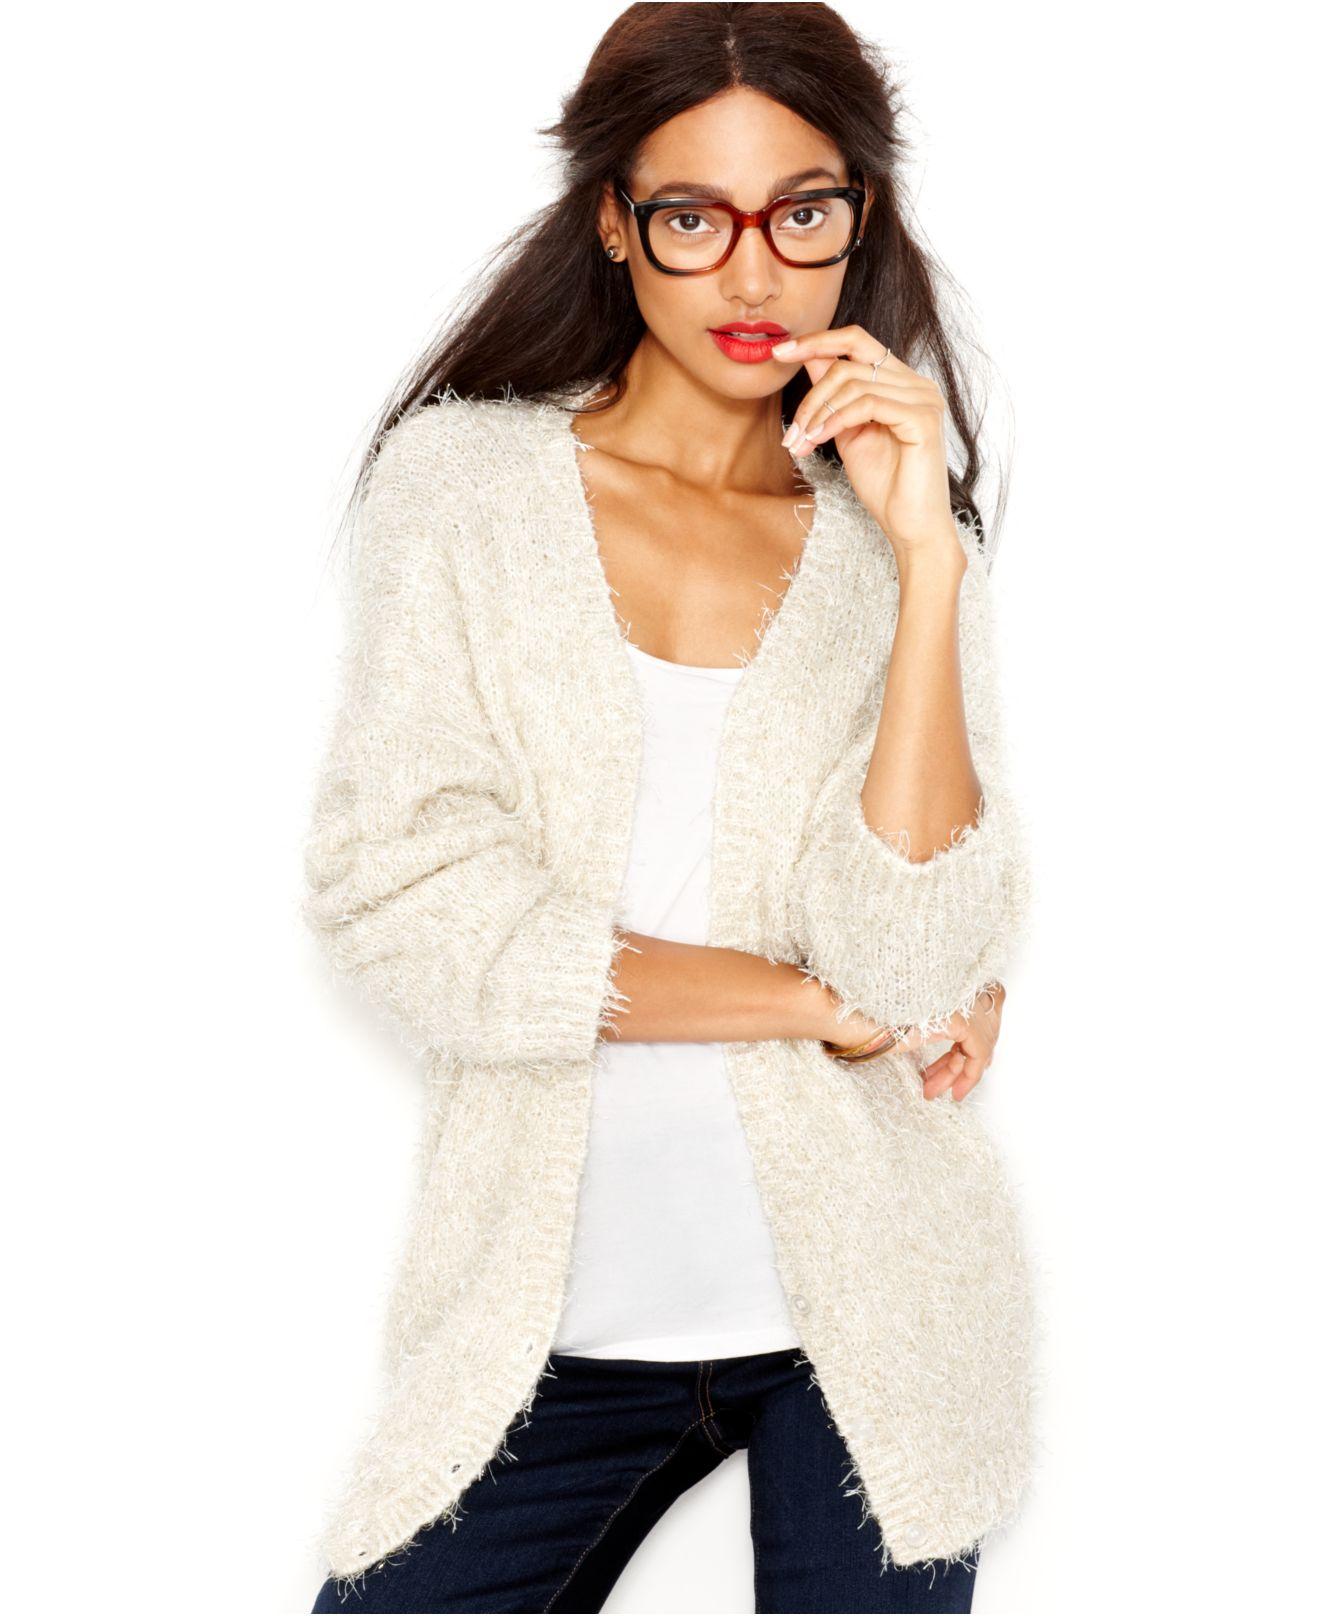 d1e49a2e56 Lyst - Maison Jules Metallic-Flecked Eyelash-Knit Cardigan in White